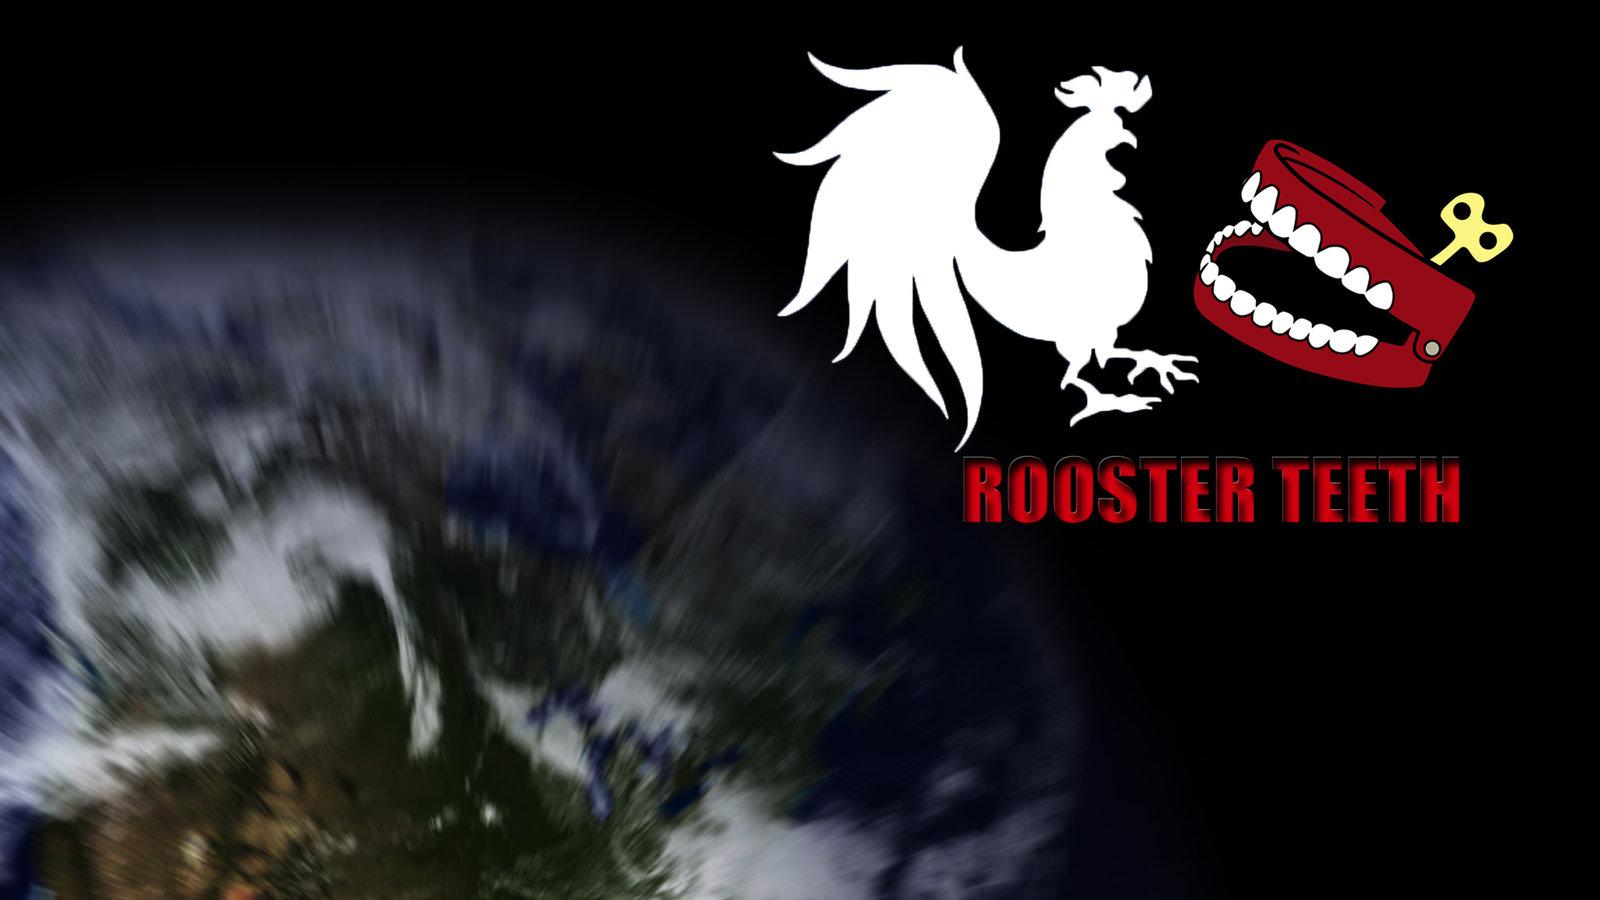 Rooster Teeth Logo Wallpaper Rooster teeth wallpaper by 1600x900